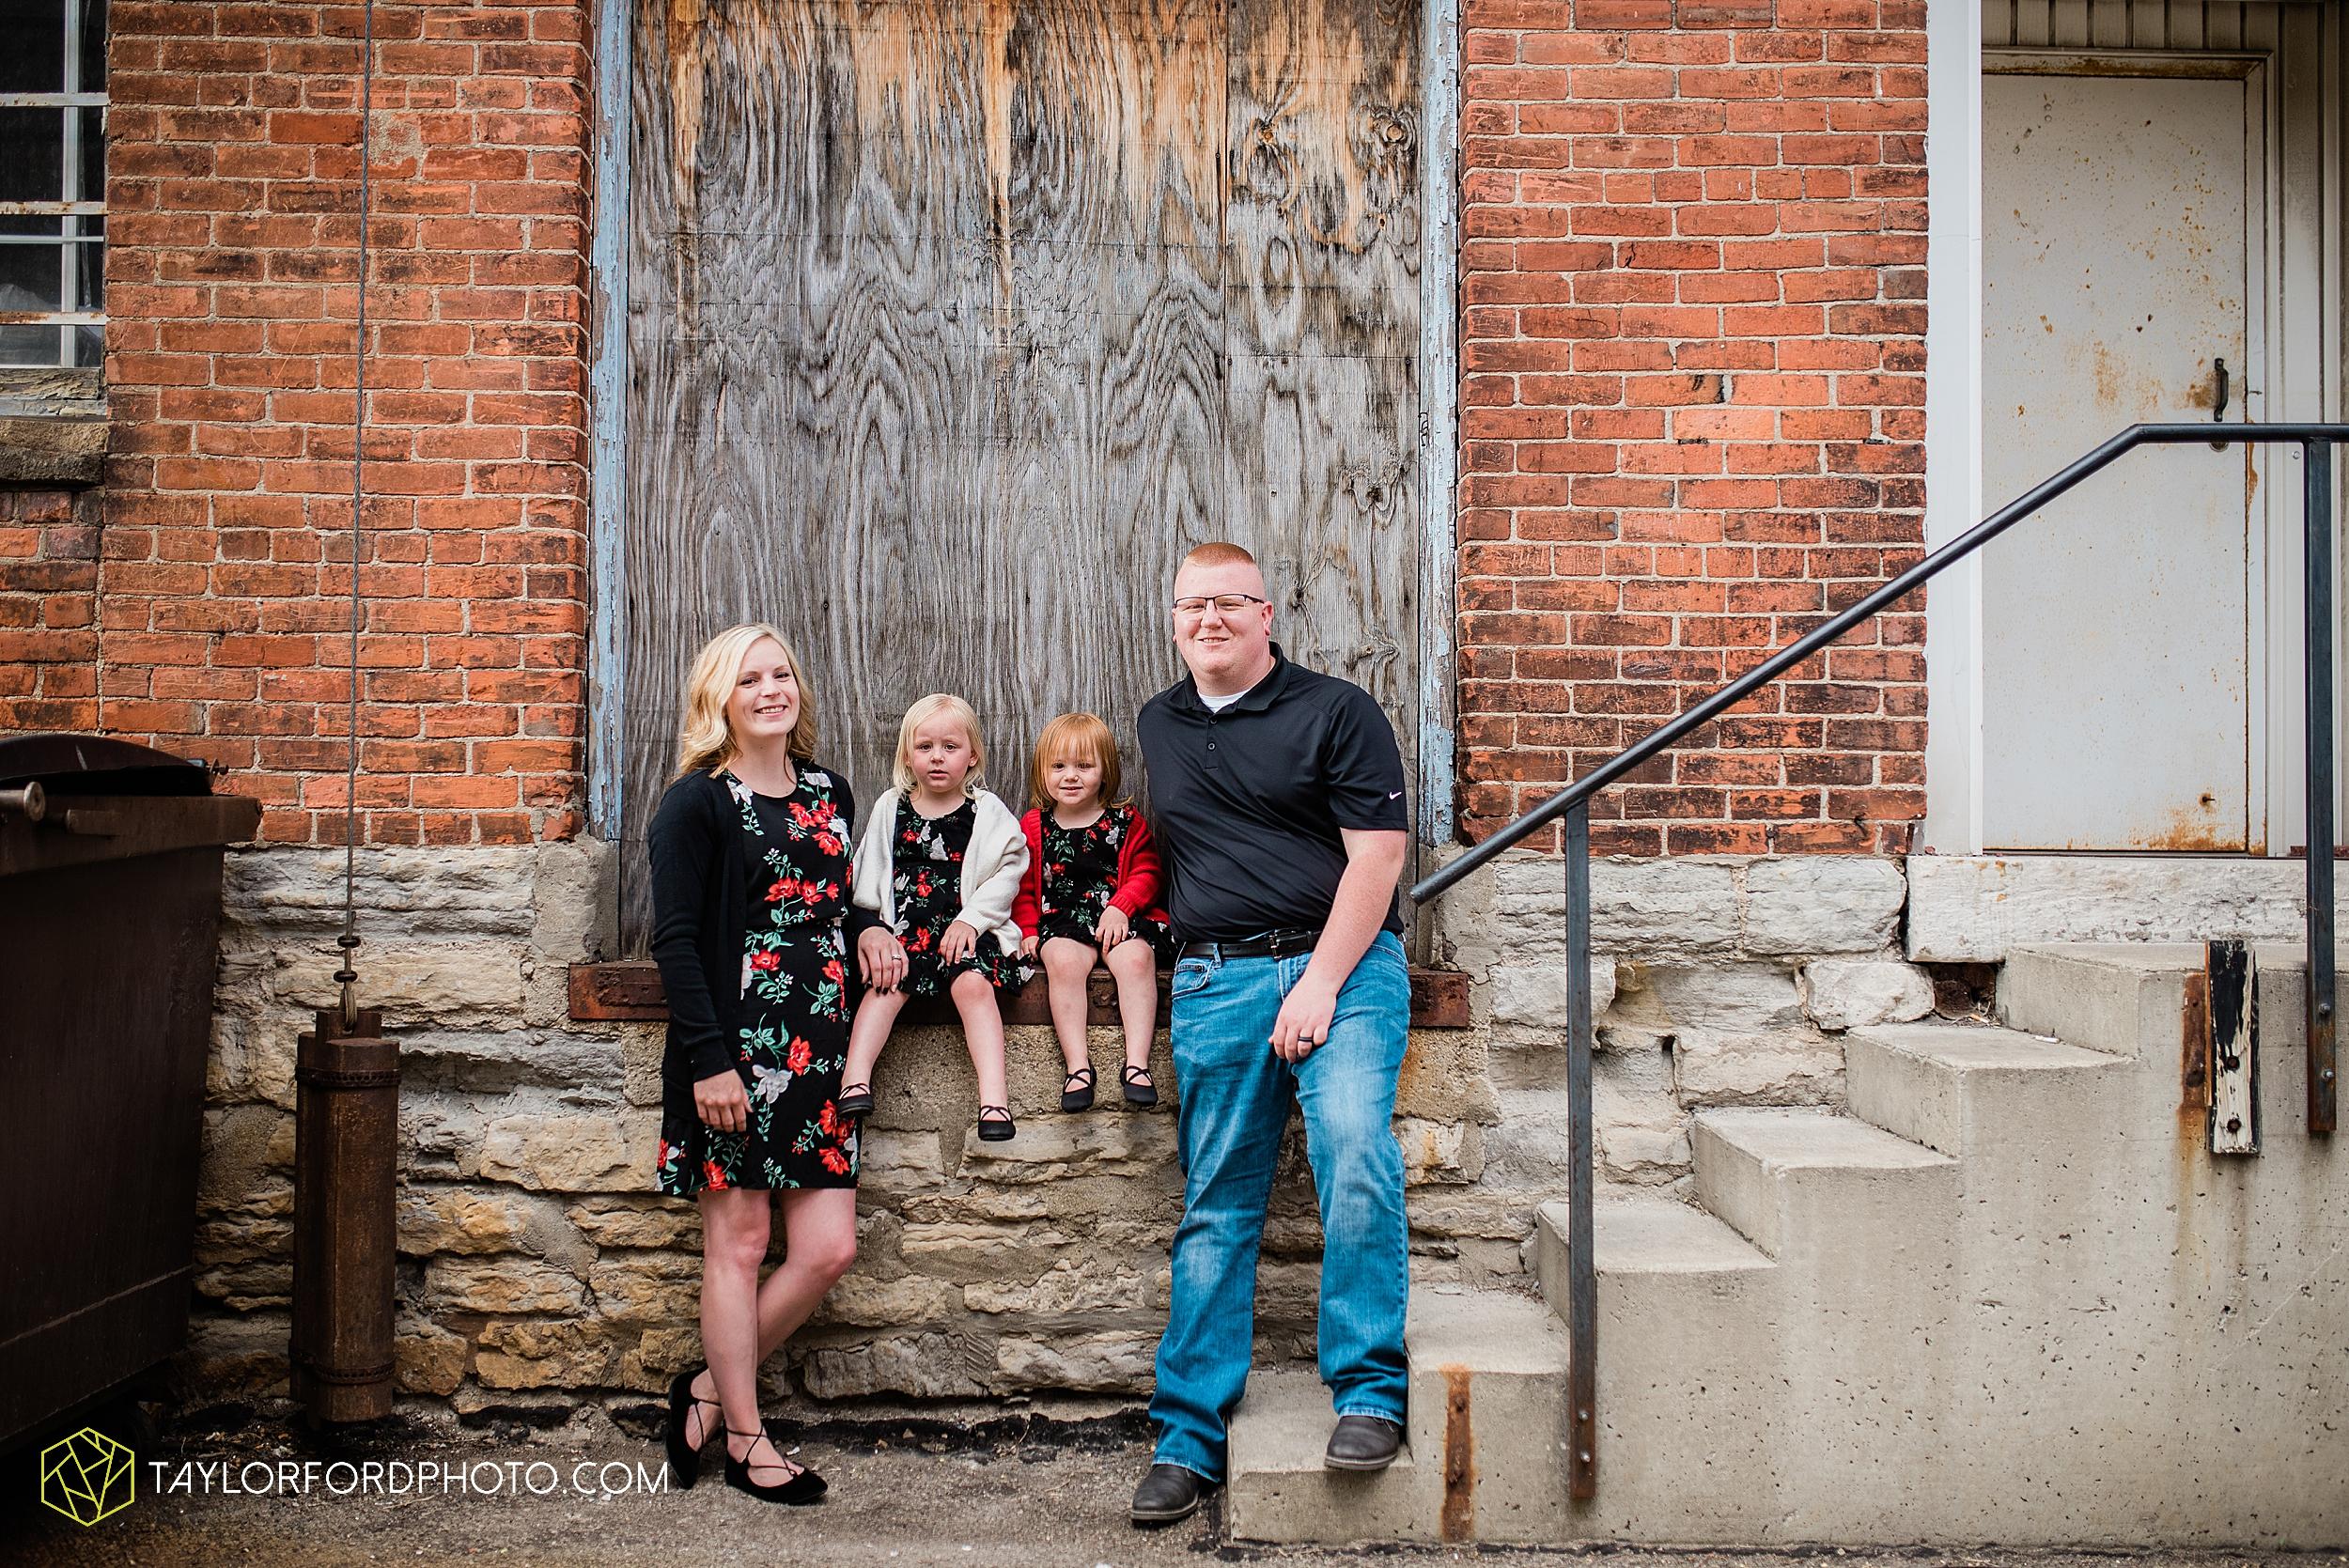 downtown-van-wert-ohio-family-photographer-photography-taylor-ford-hirschy-photographer_2680.jpg